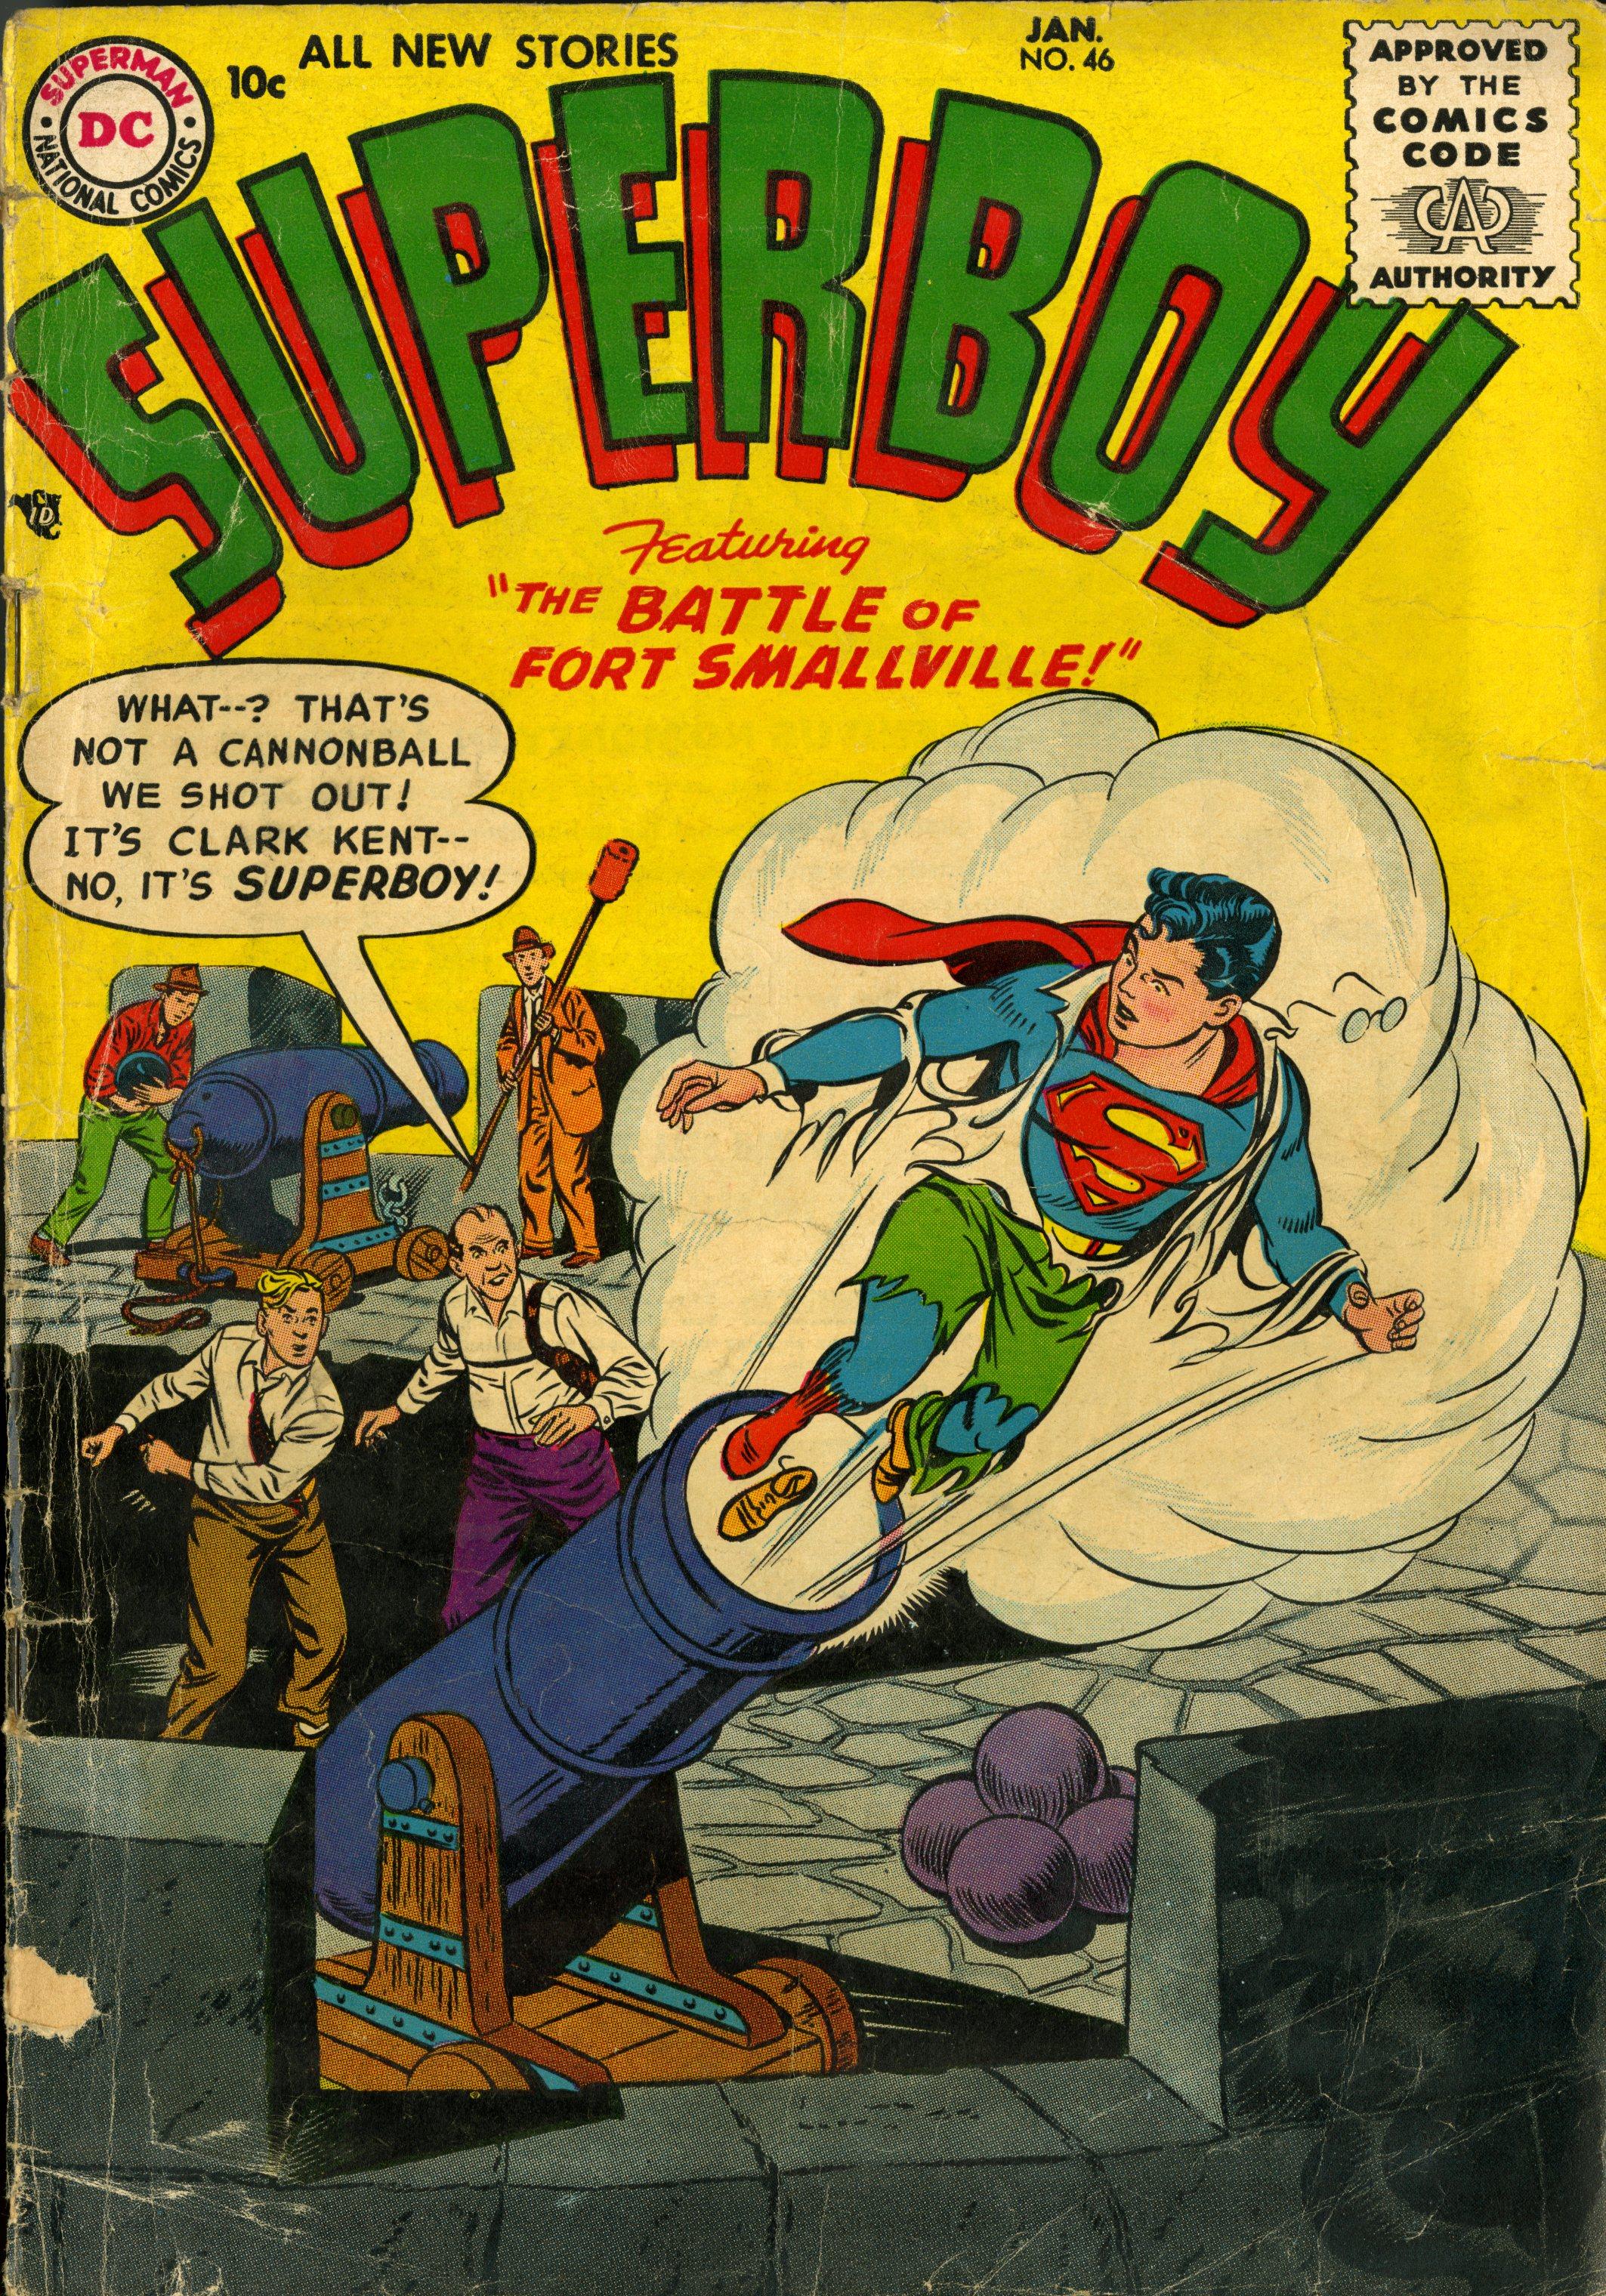 Superboy no 46 January 1956.jpg